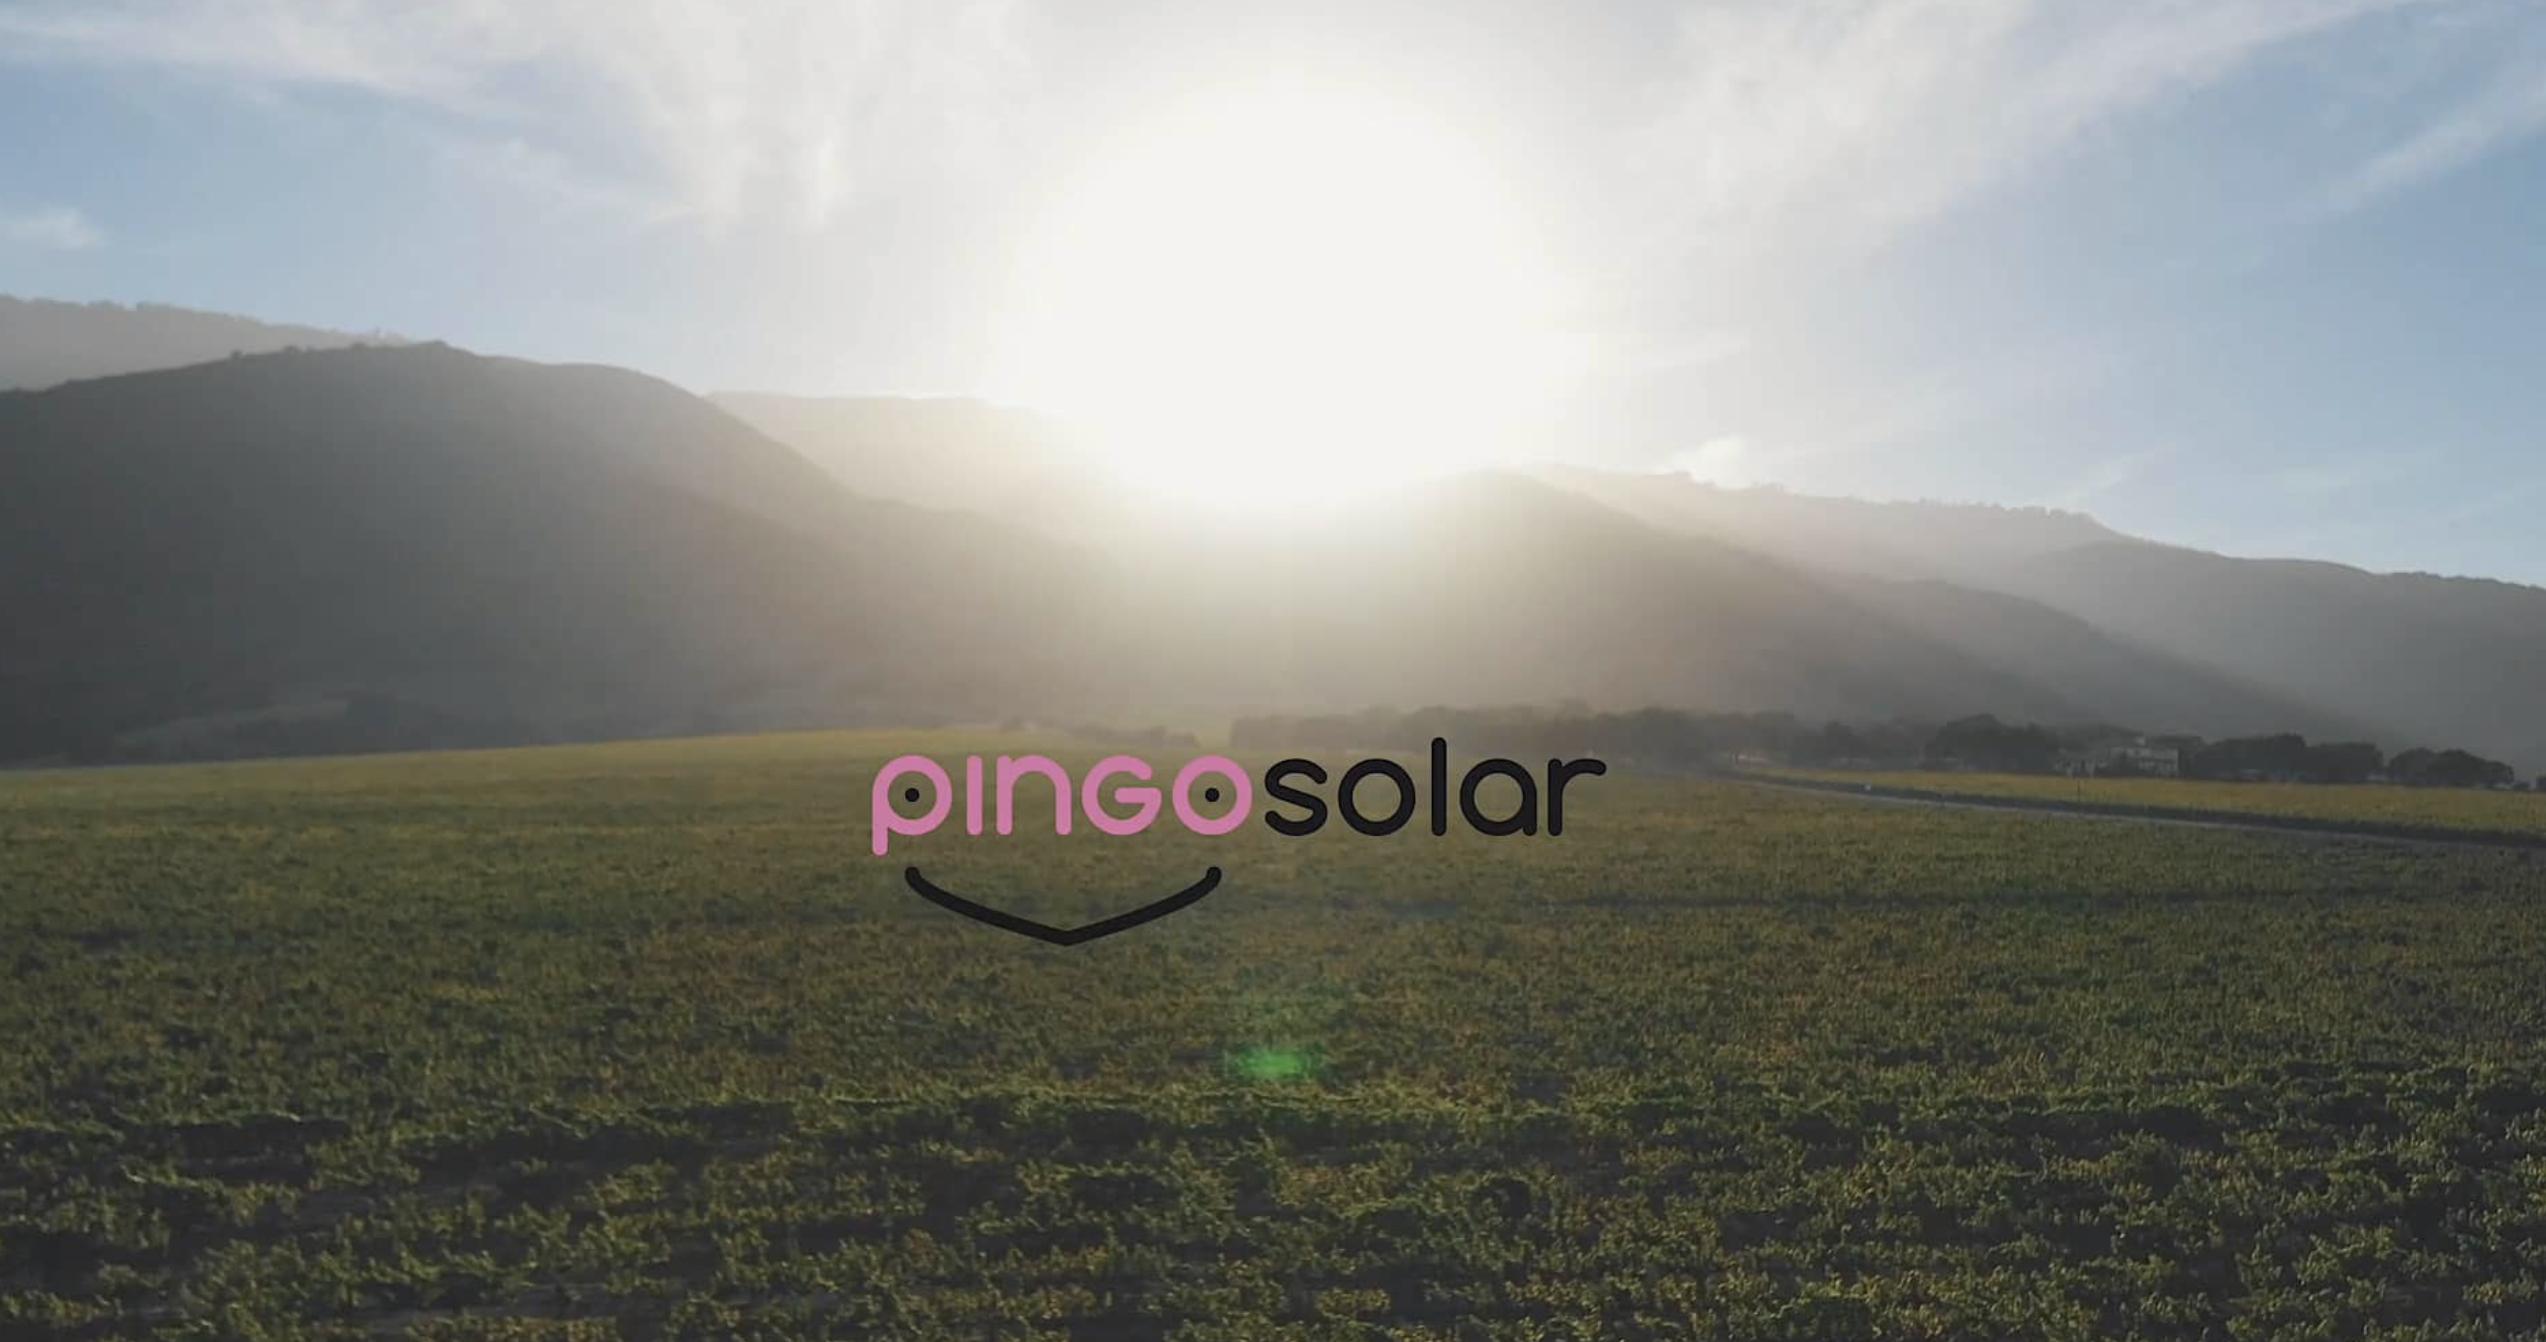 Pingo Solar